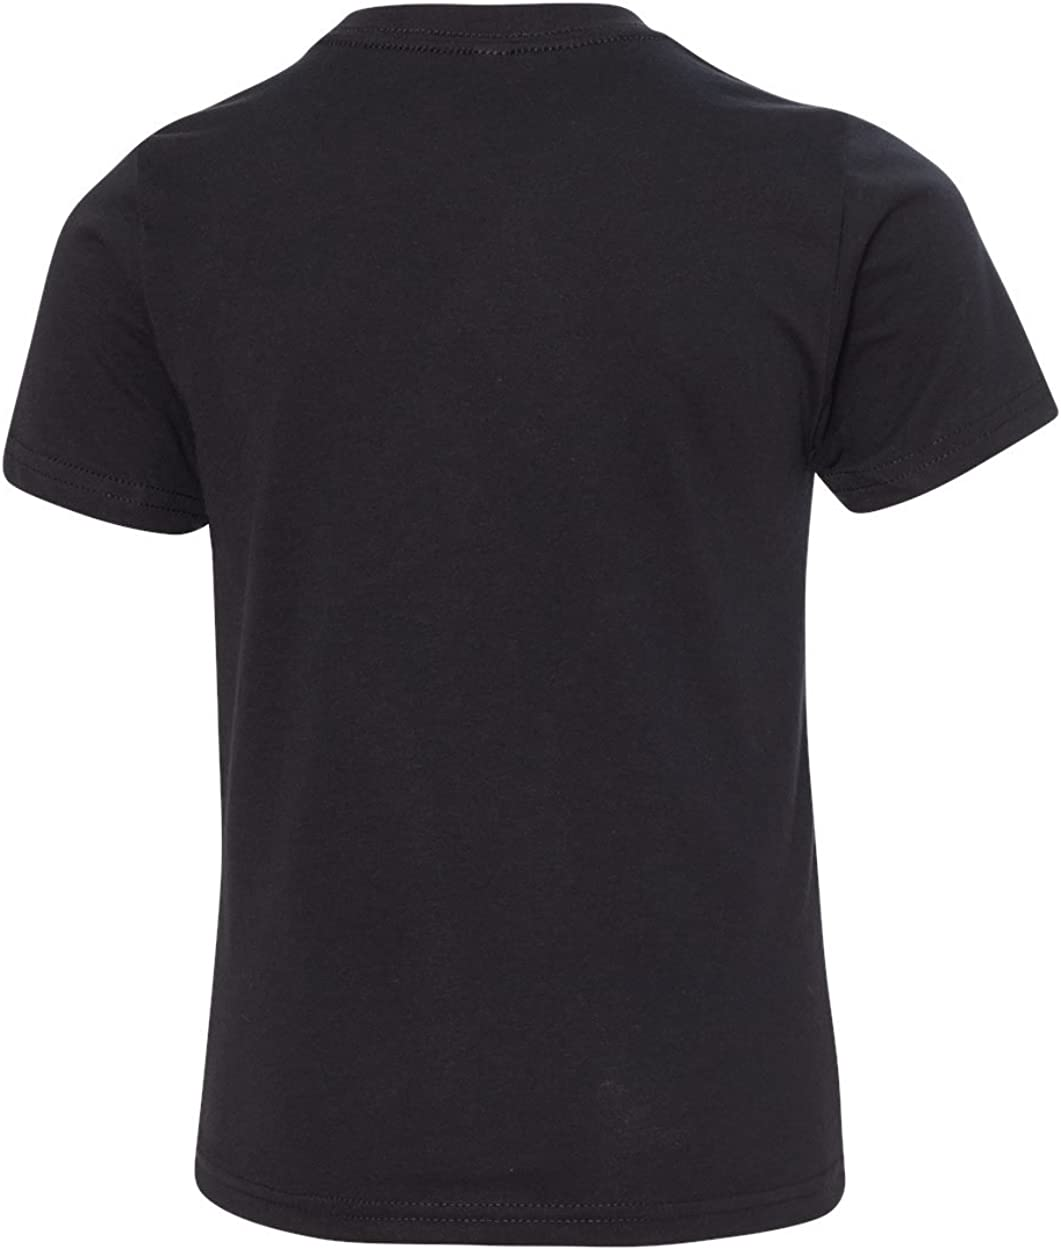 Small Orange Next Level Big Boys Crewneck Shrinkage Gorgeous T-Shirt